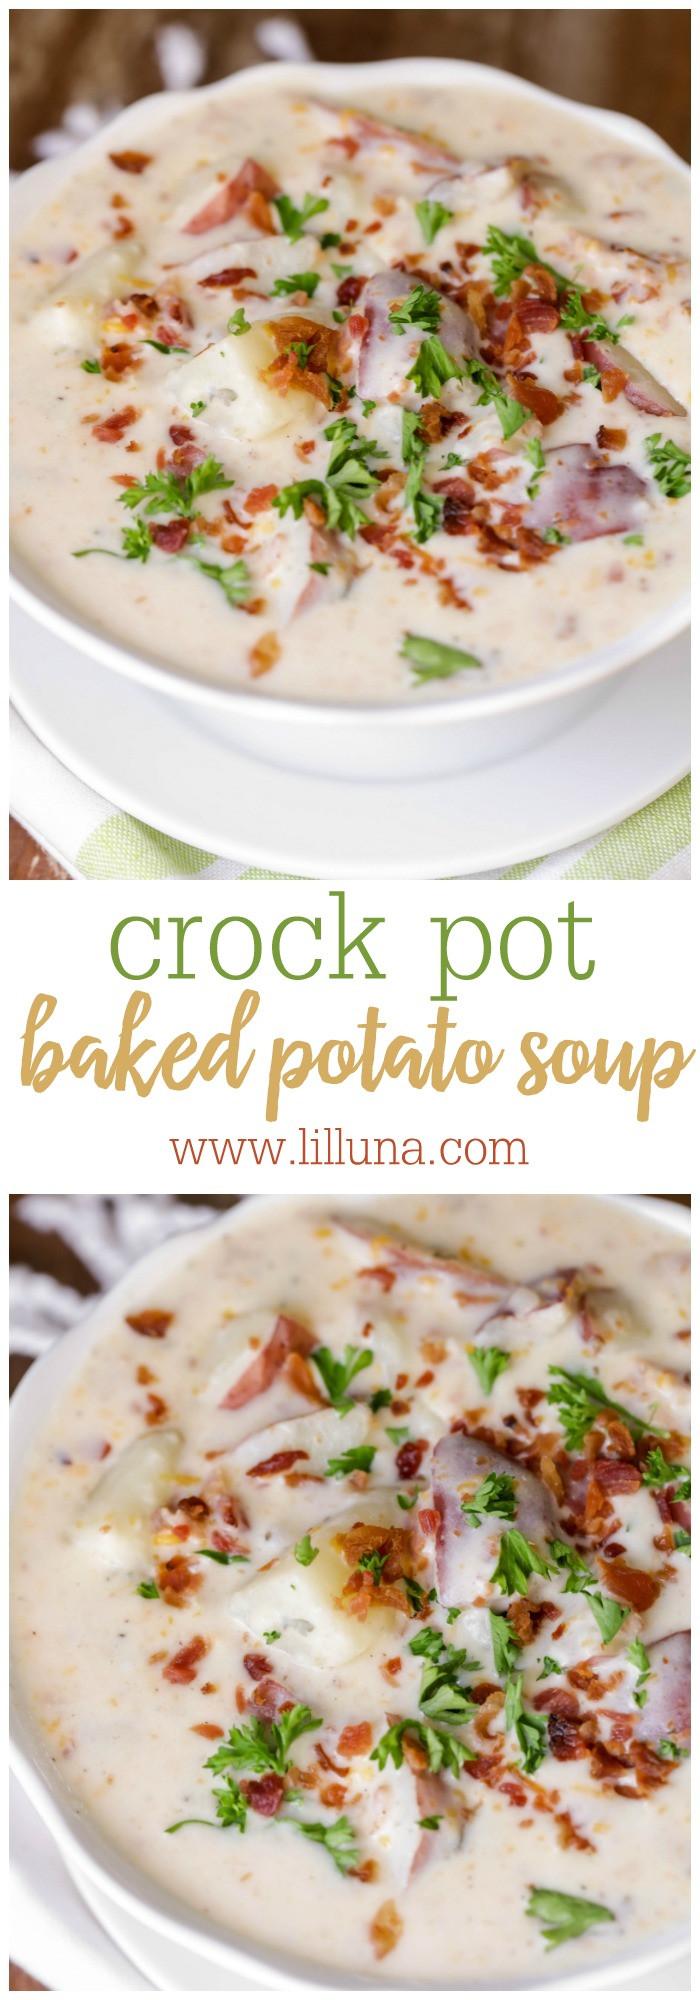 Baked Potato Soup Crock Pot  Crock Pot Baked Potato Soup